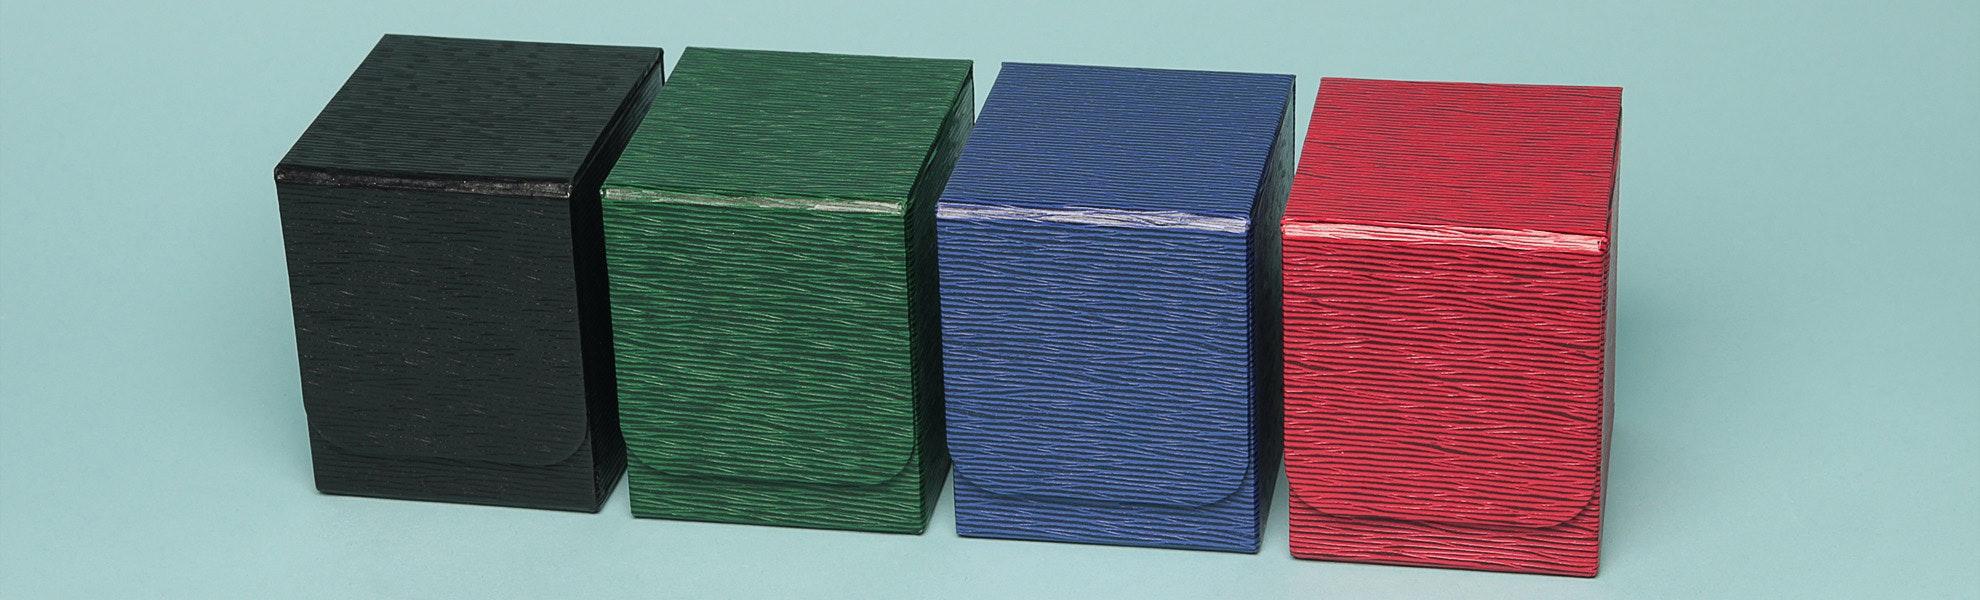 Dex Protection Baseline Deck Box (2-Pack)